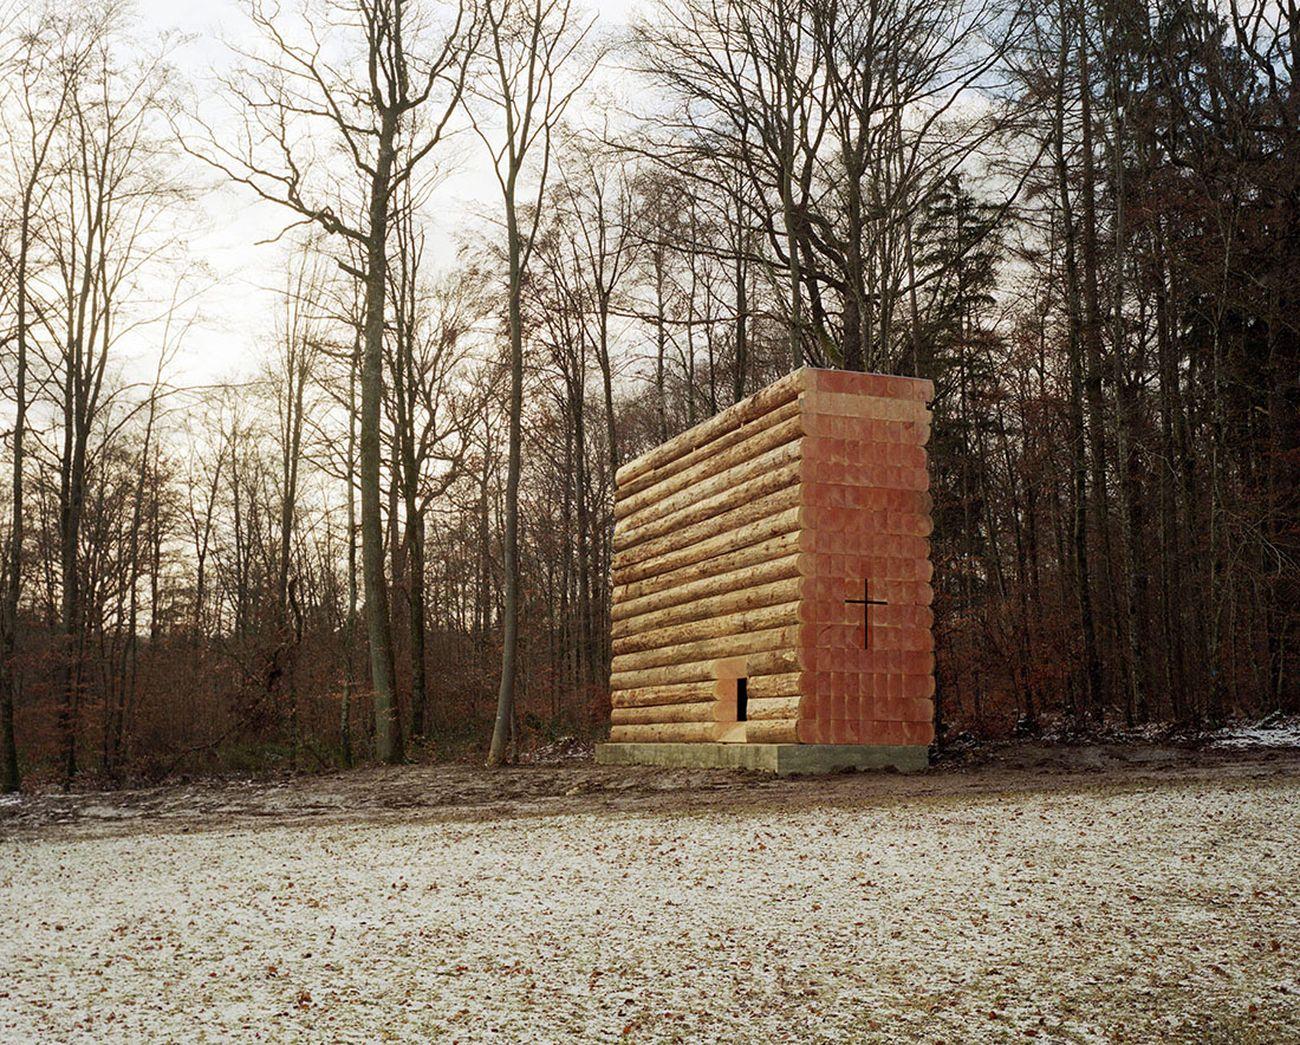 John Pawson, Wooden chapel Unterliezheim, Germany. Photo Felix Friedman